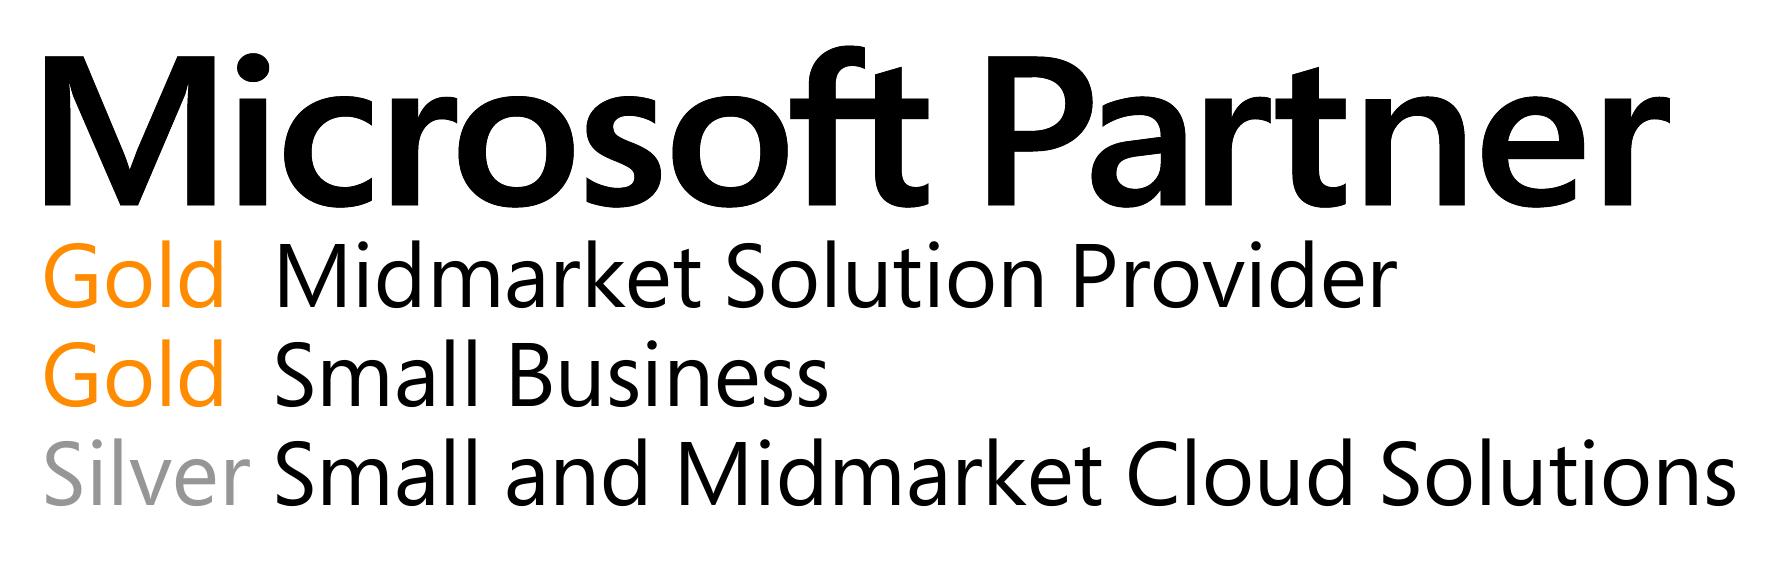 Microsoft Gold Partner January 2016